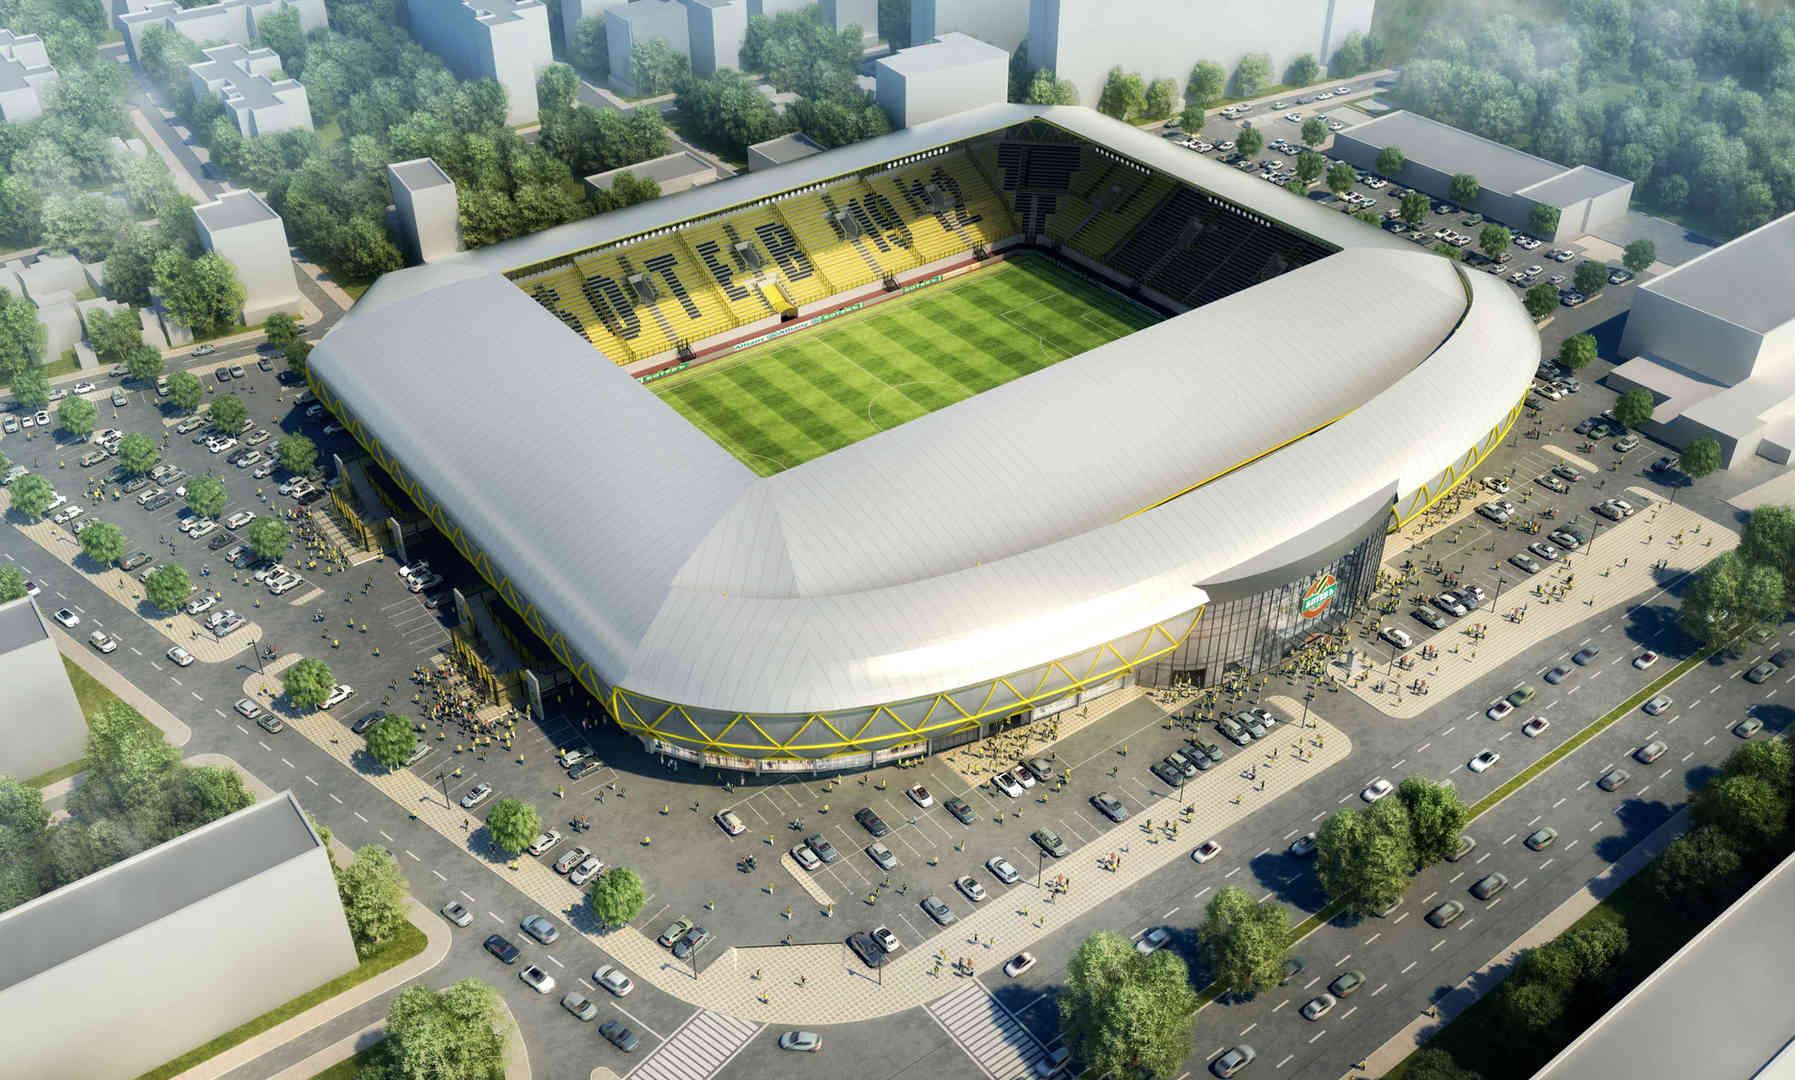 Vamos_Botev_Stadion_CGI01_01.jpg